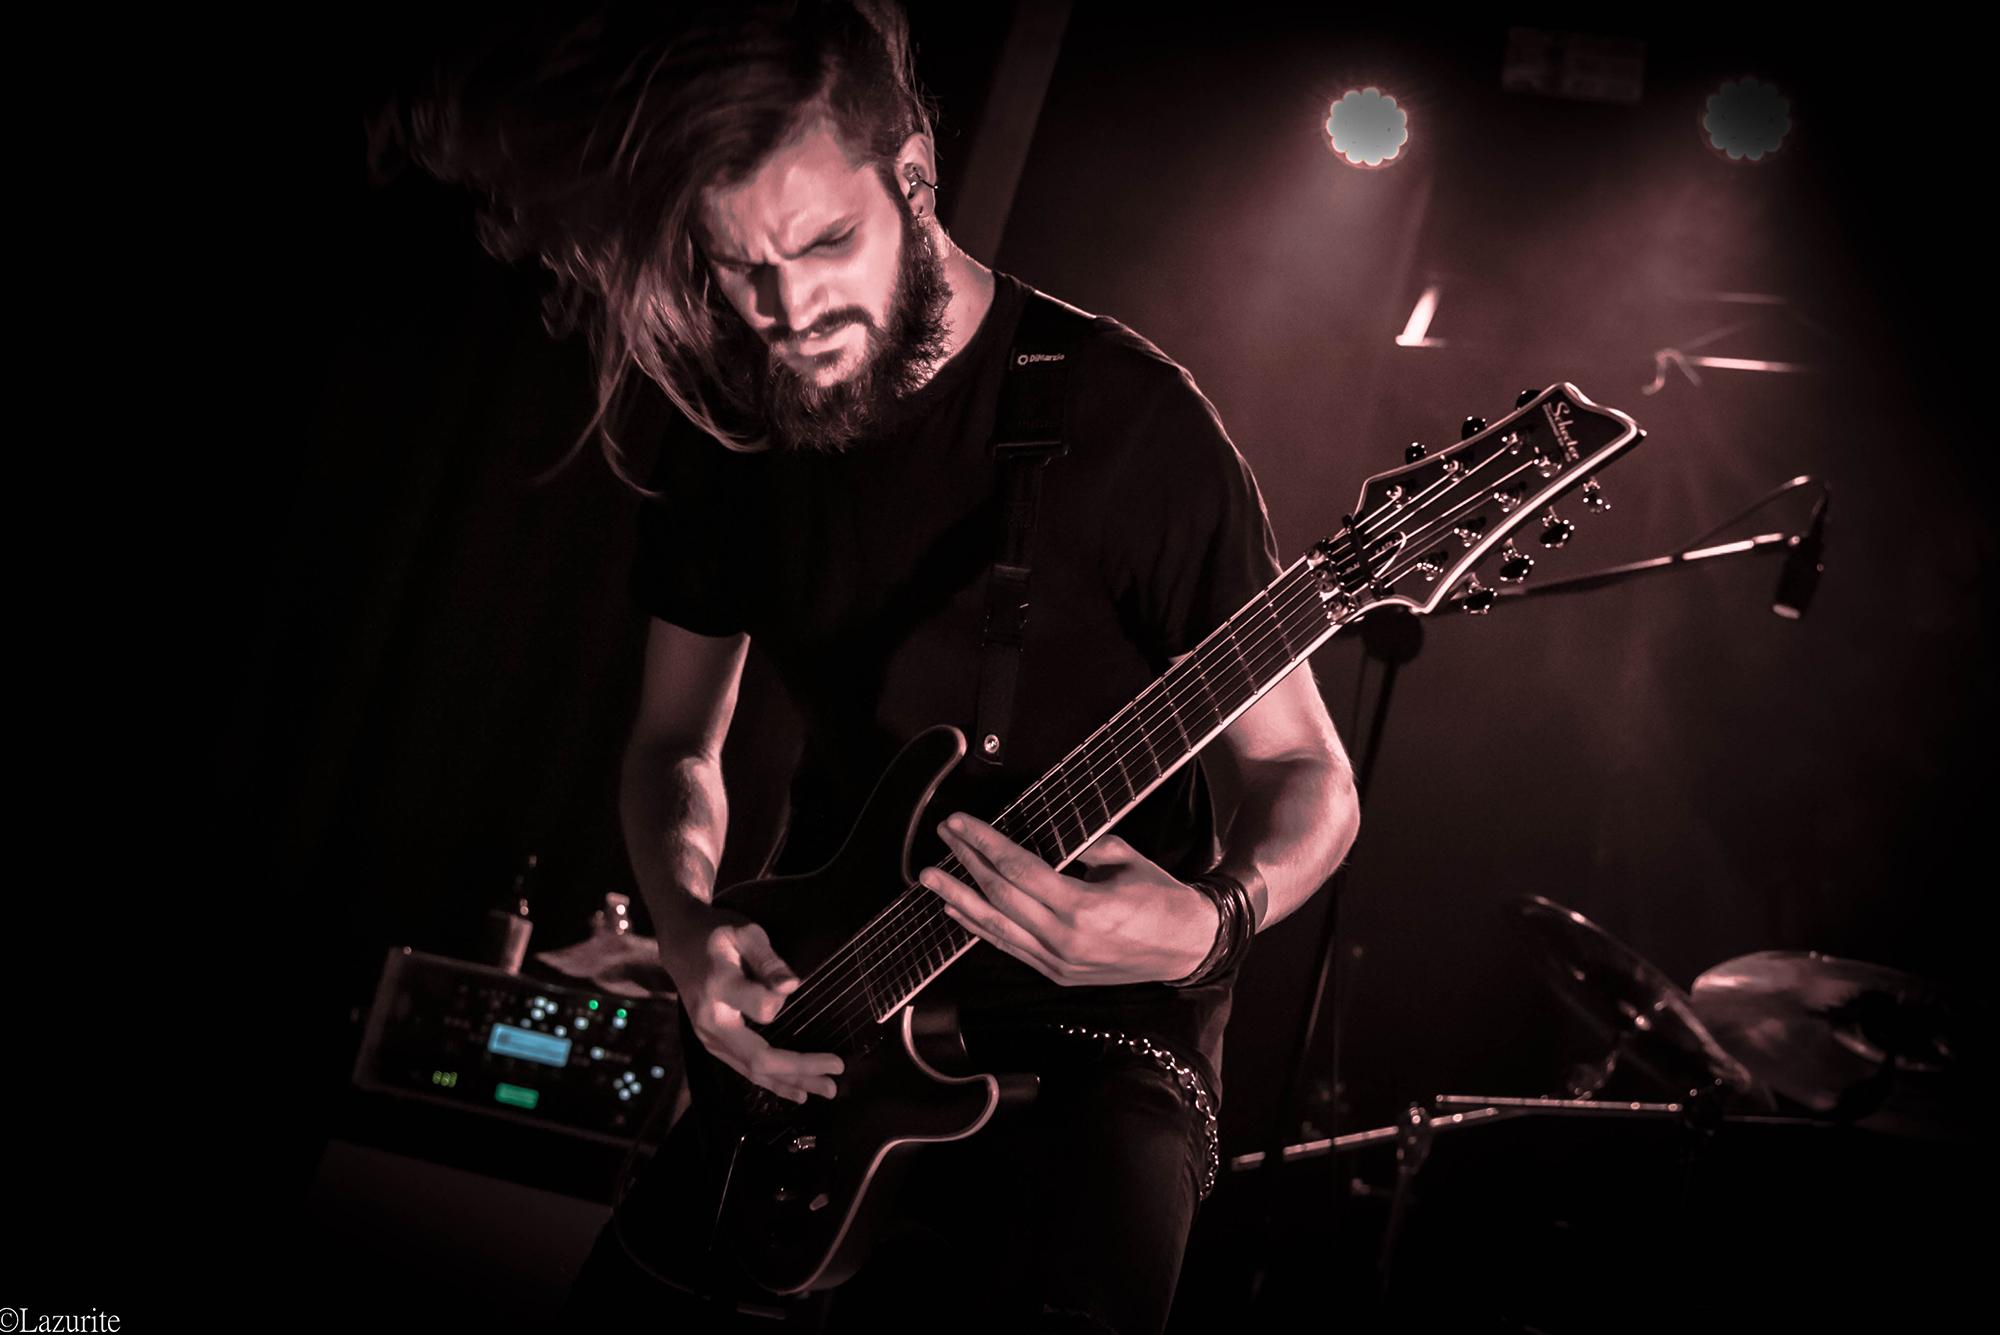 Guitarist_Live1